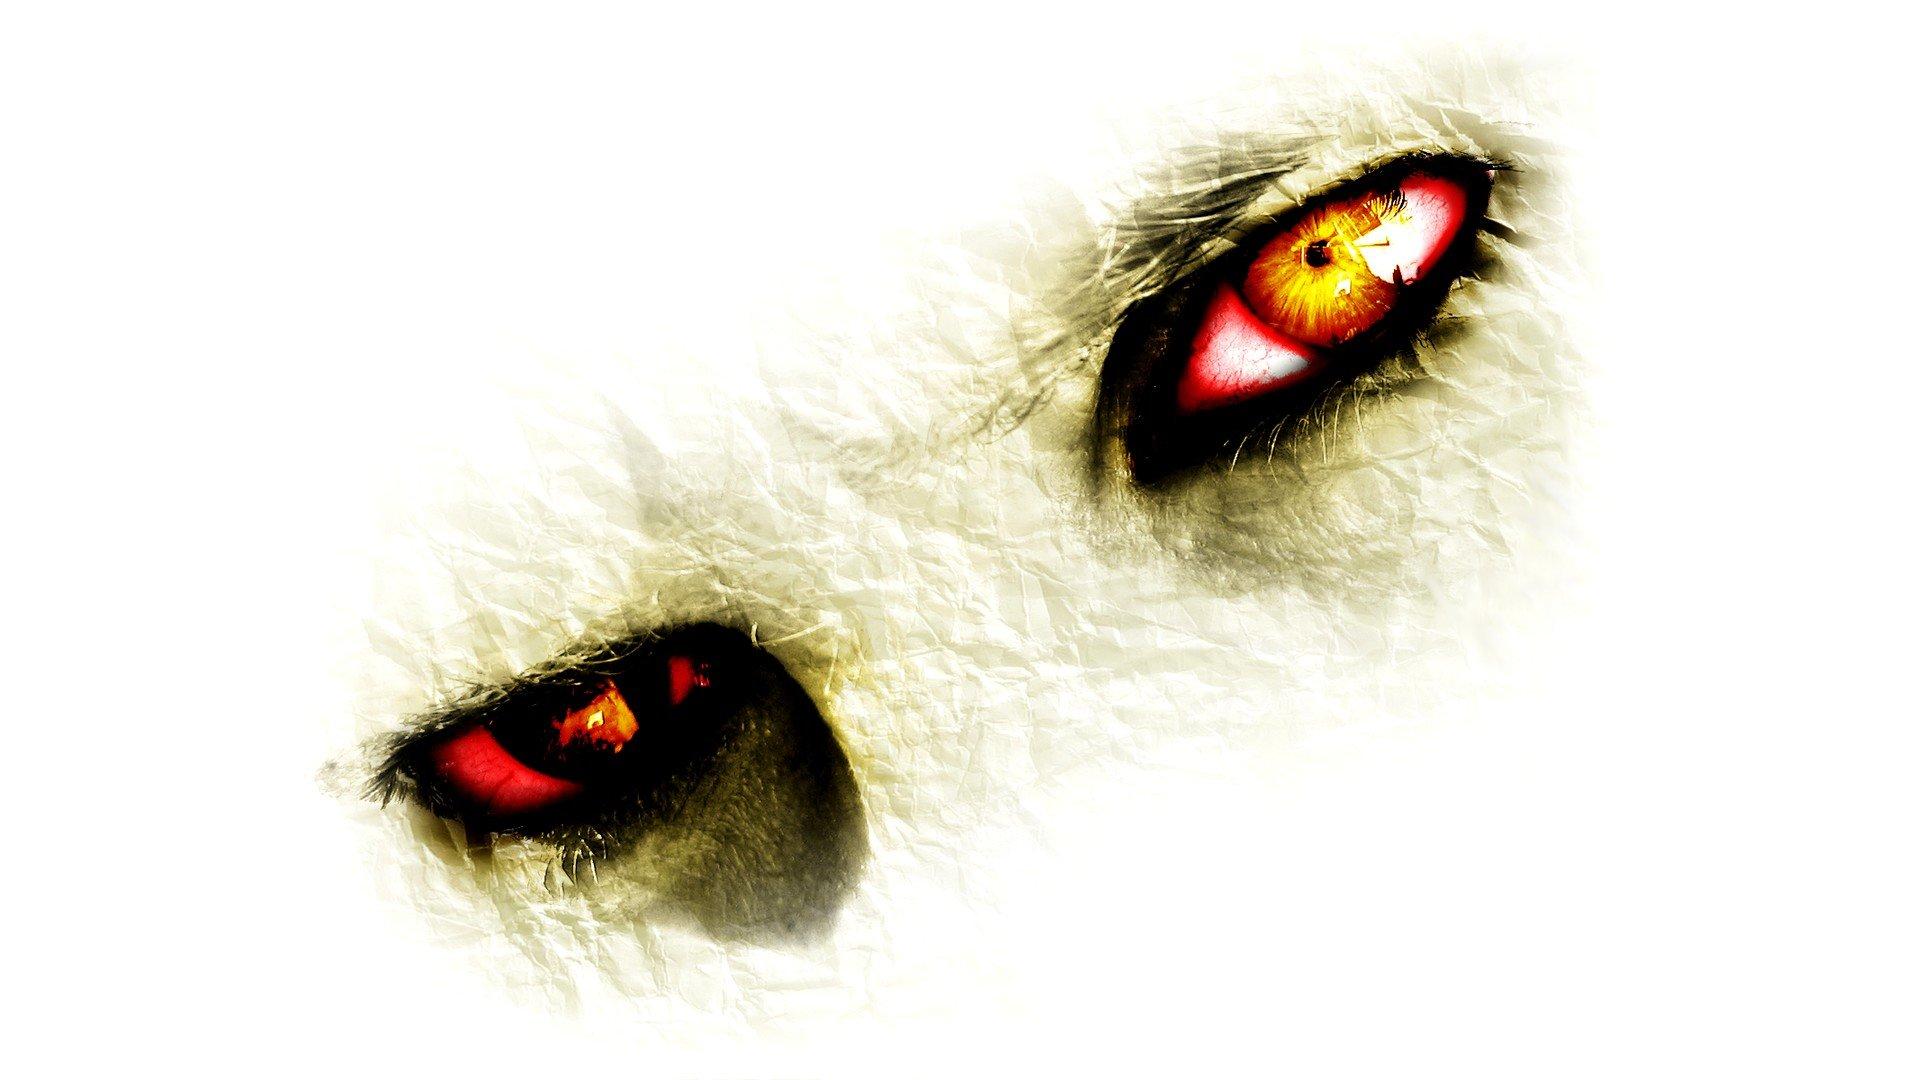 Evil eye wallpapers 1920x1080 Full HD (1080p) desktop ...